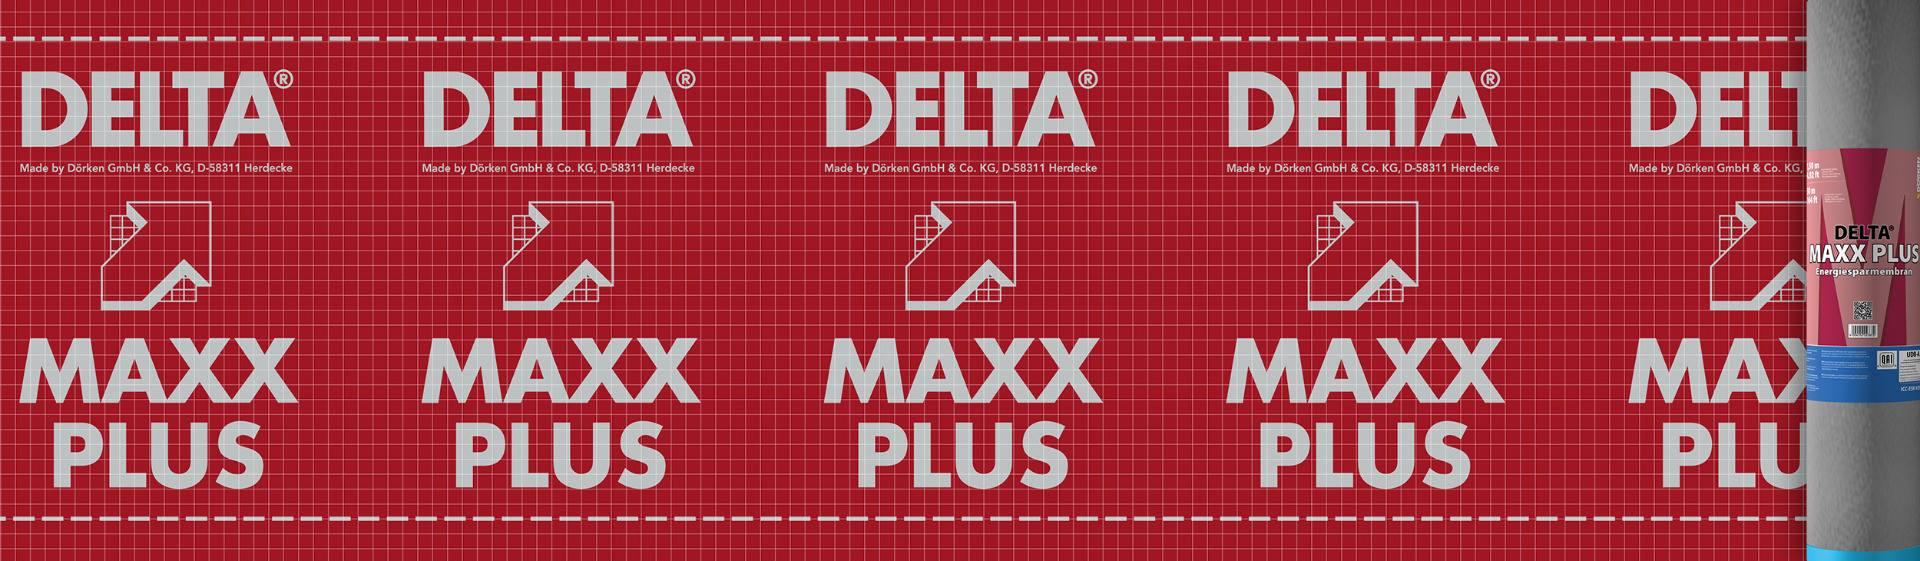 Dörken DELTA®-MAXX PLUS Energiemembran in Gevelsberg kaufen